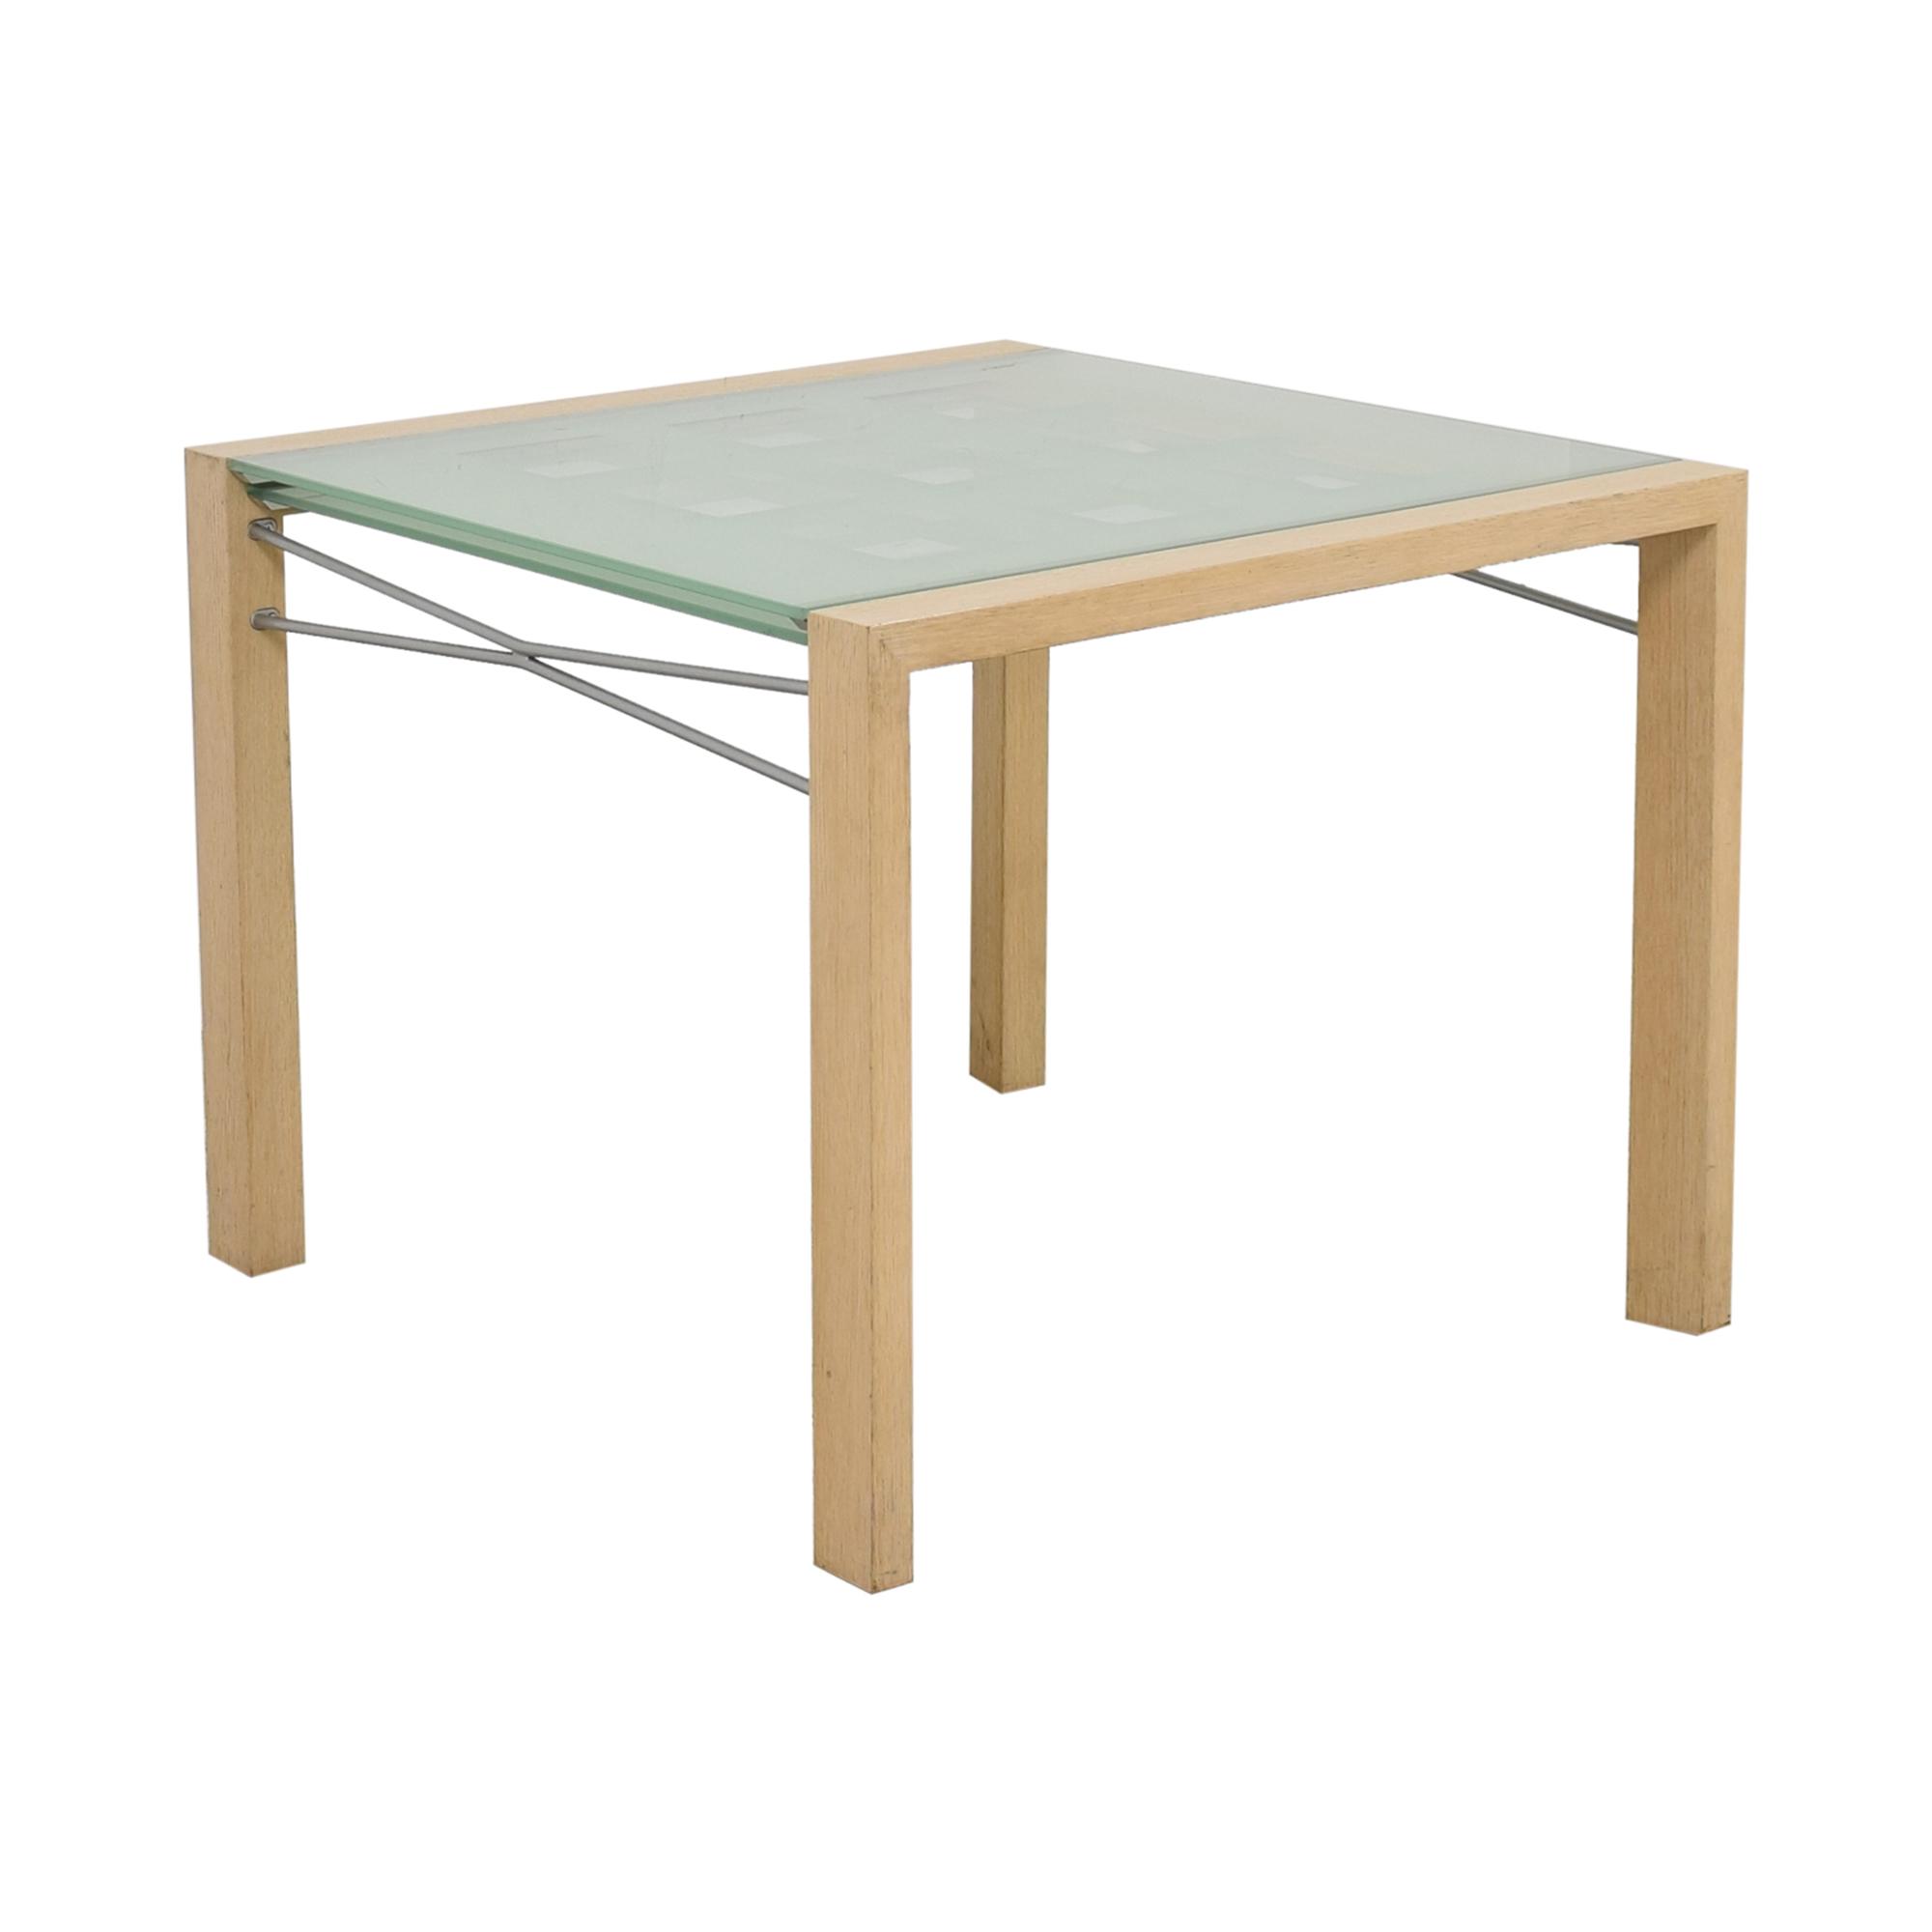 Ligne Roset Ligne Roset Extensia Extendable Dining Table dimensions